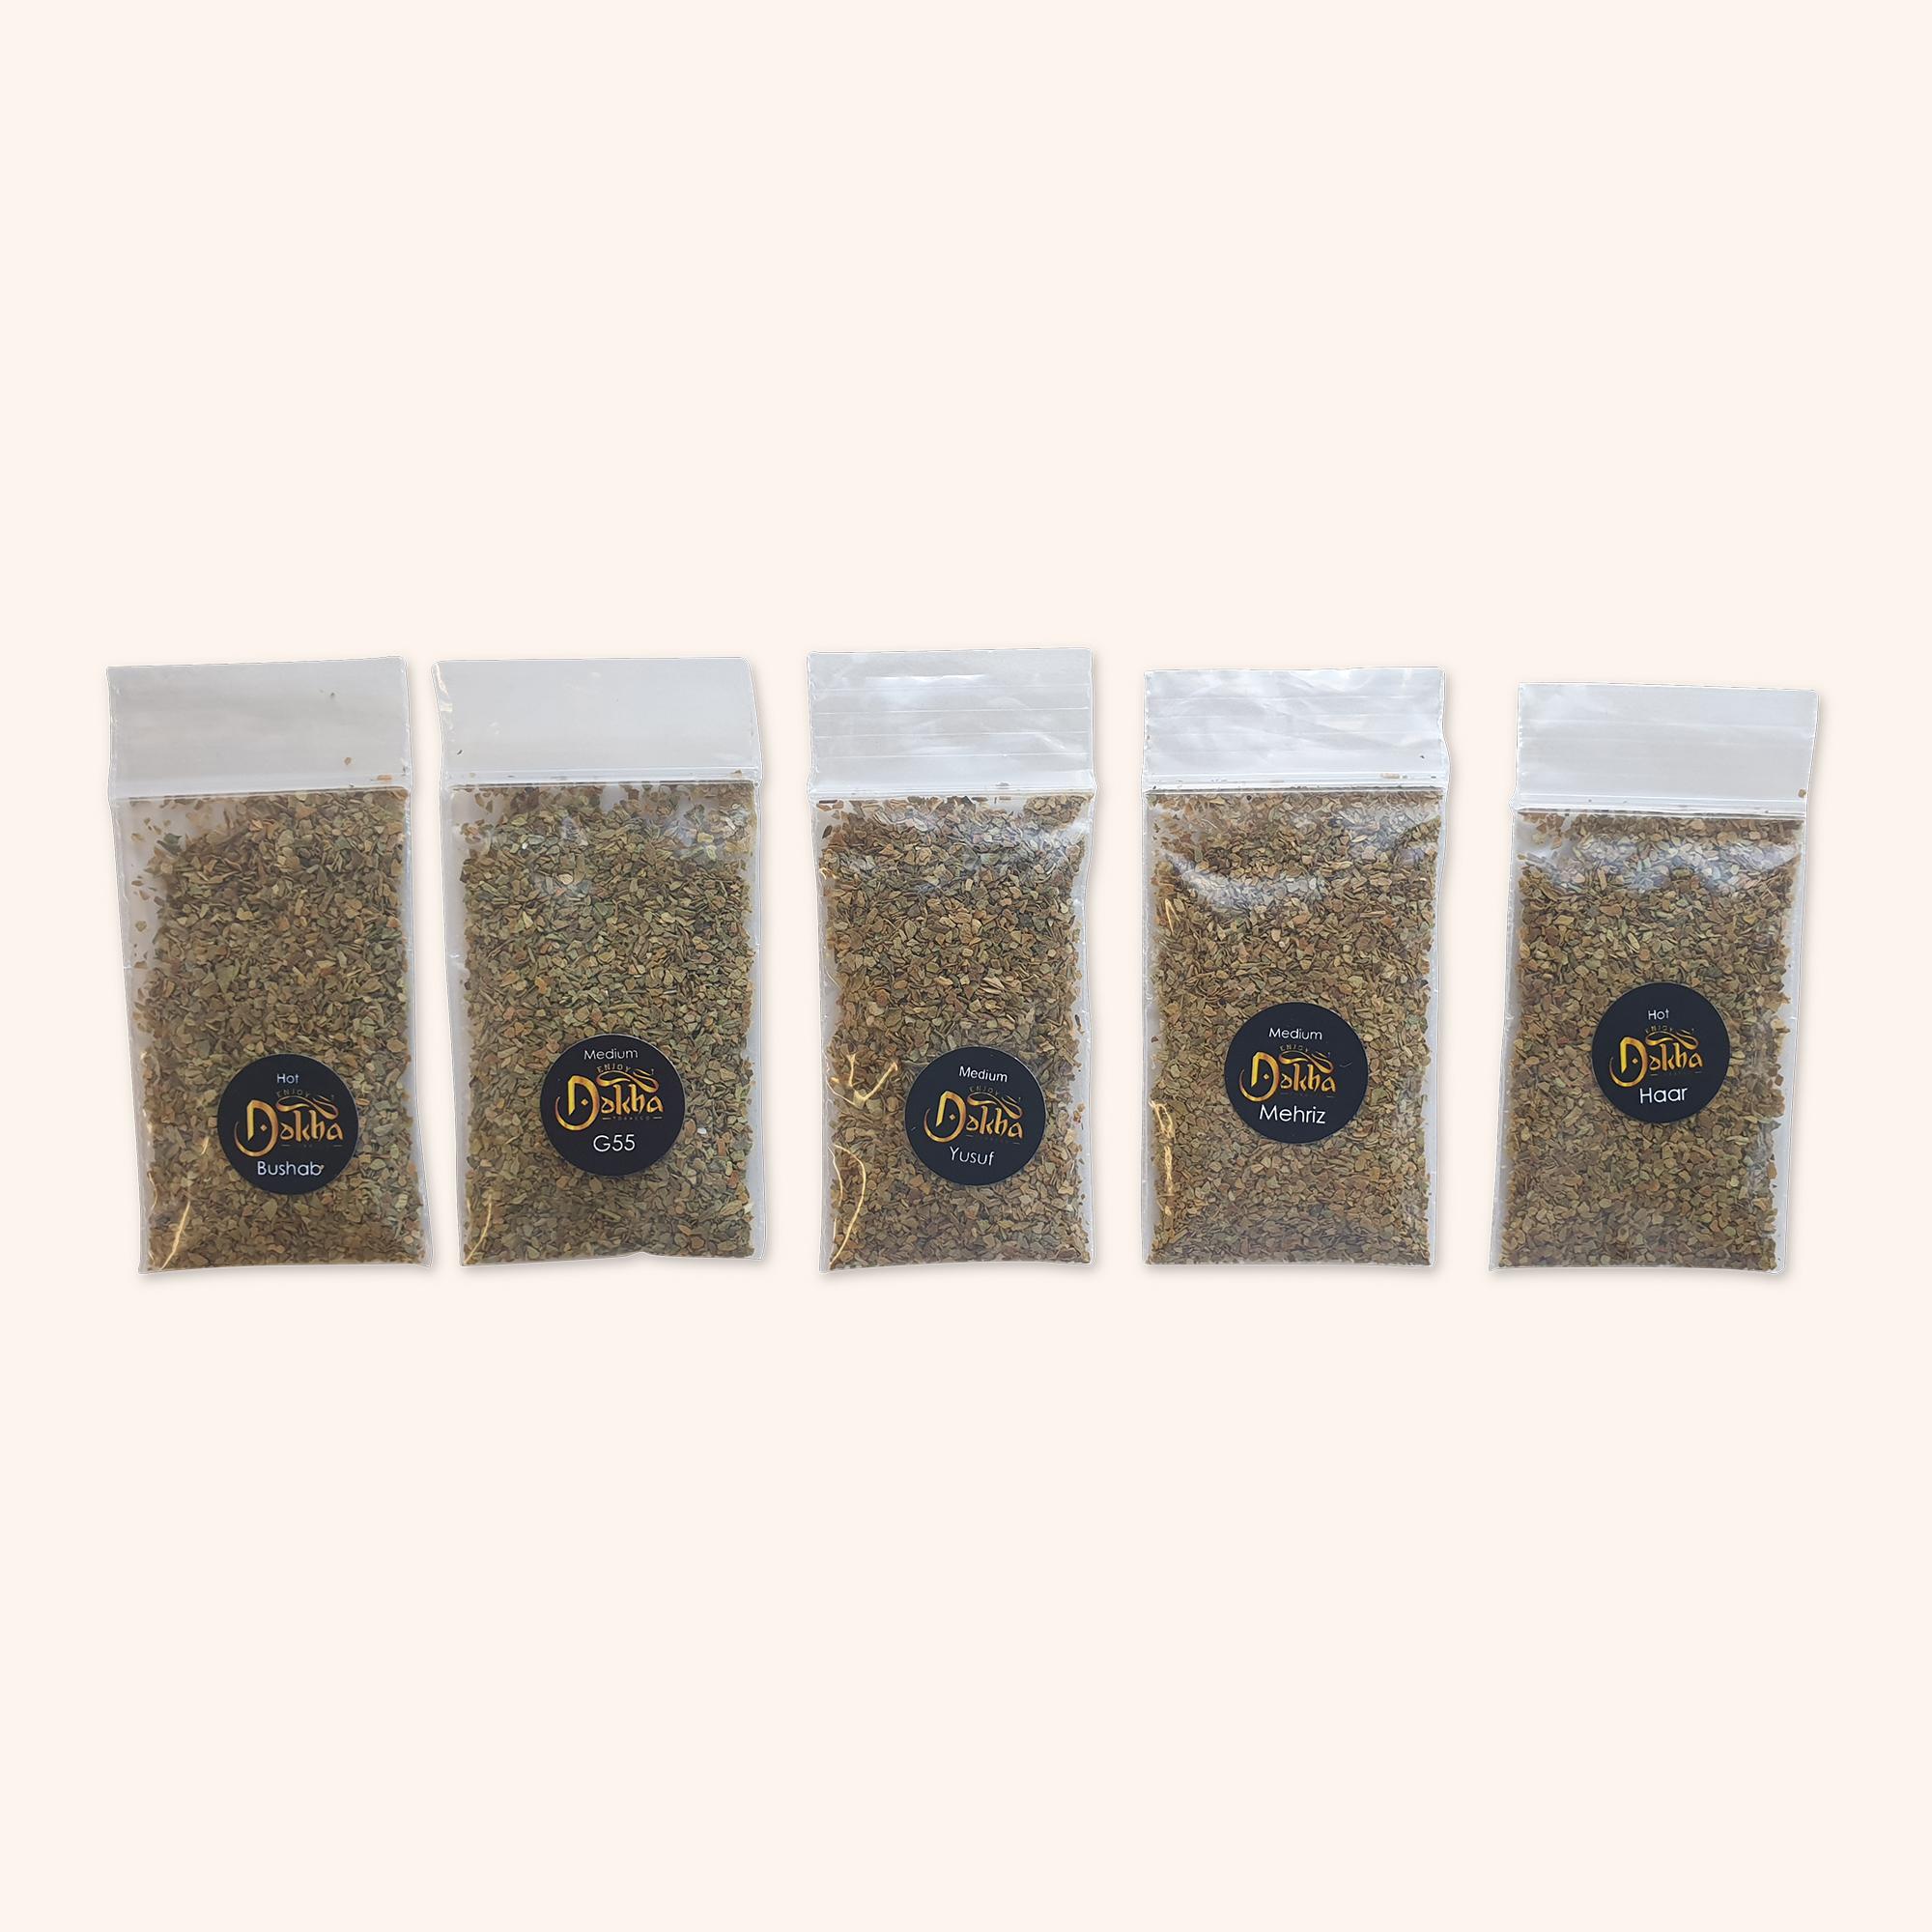 5 Sample Dokha Bags